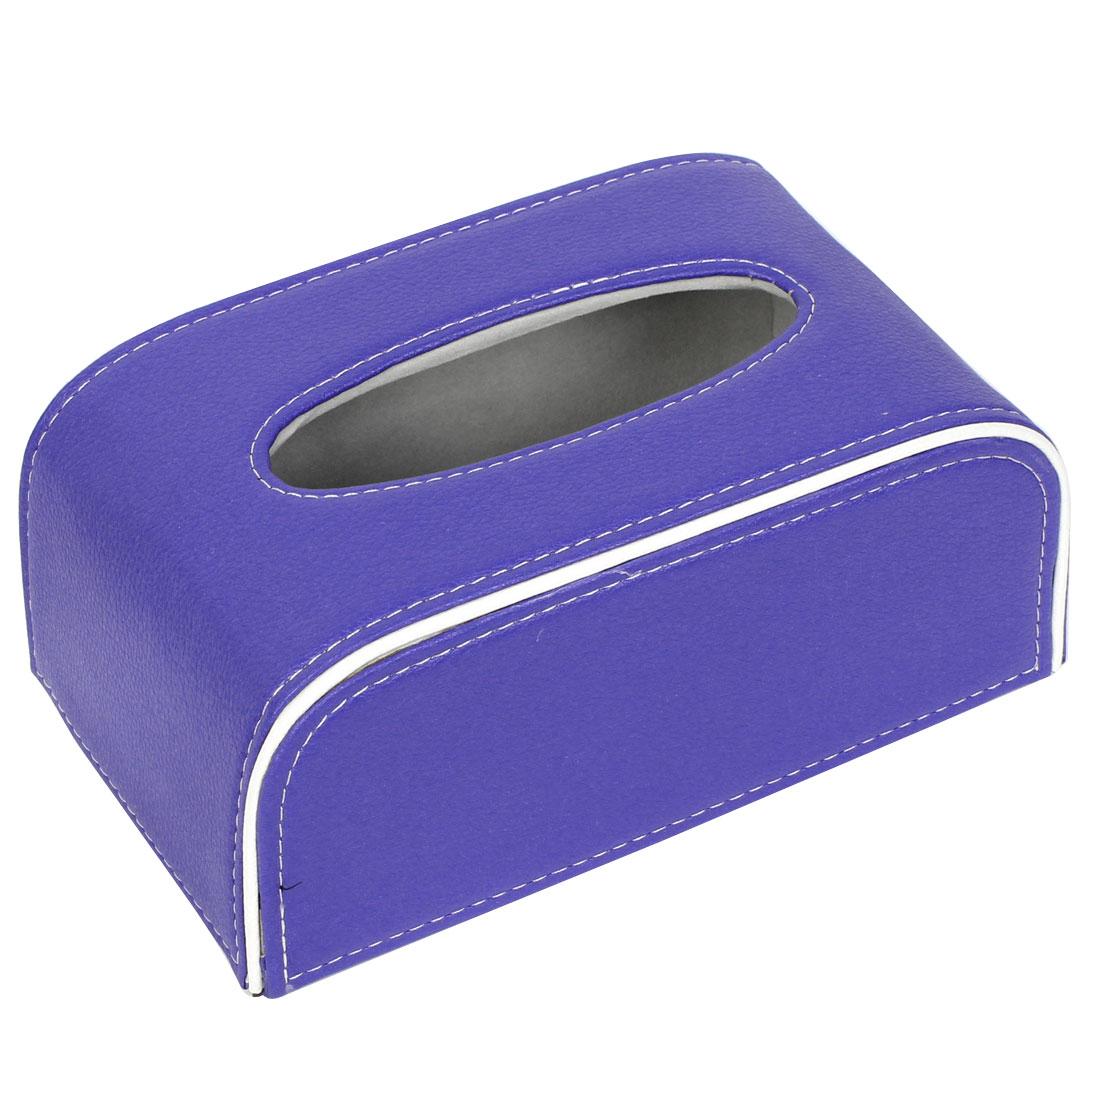 Blue White Faux Leather Rectangular Tissue Box Holder Case 21cm x 12.5cm x 9cm